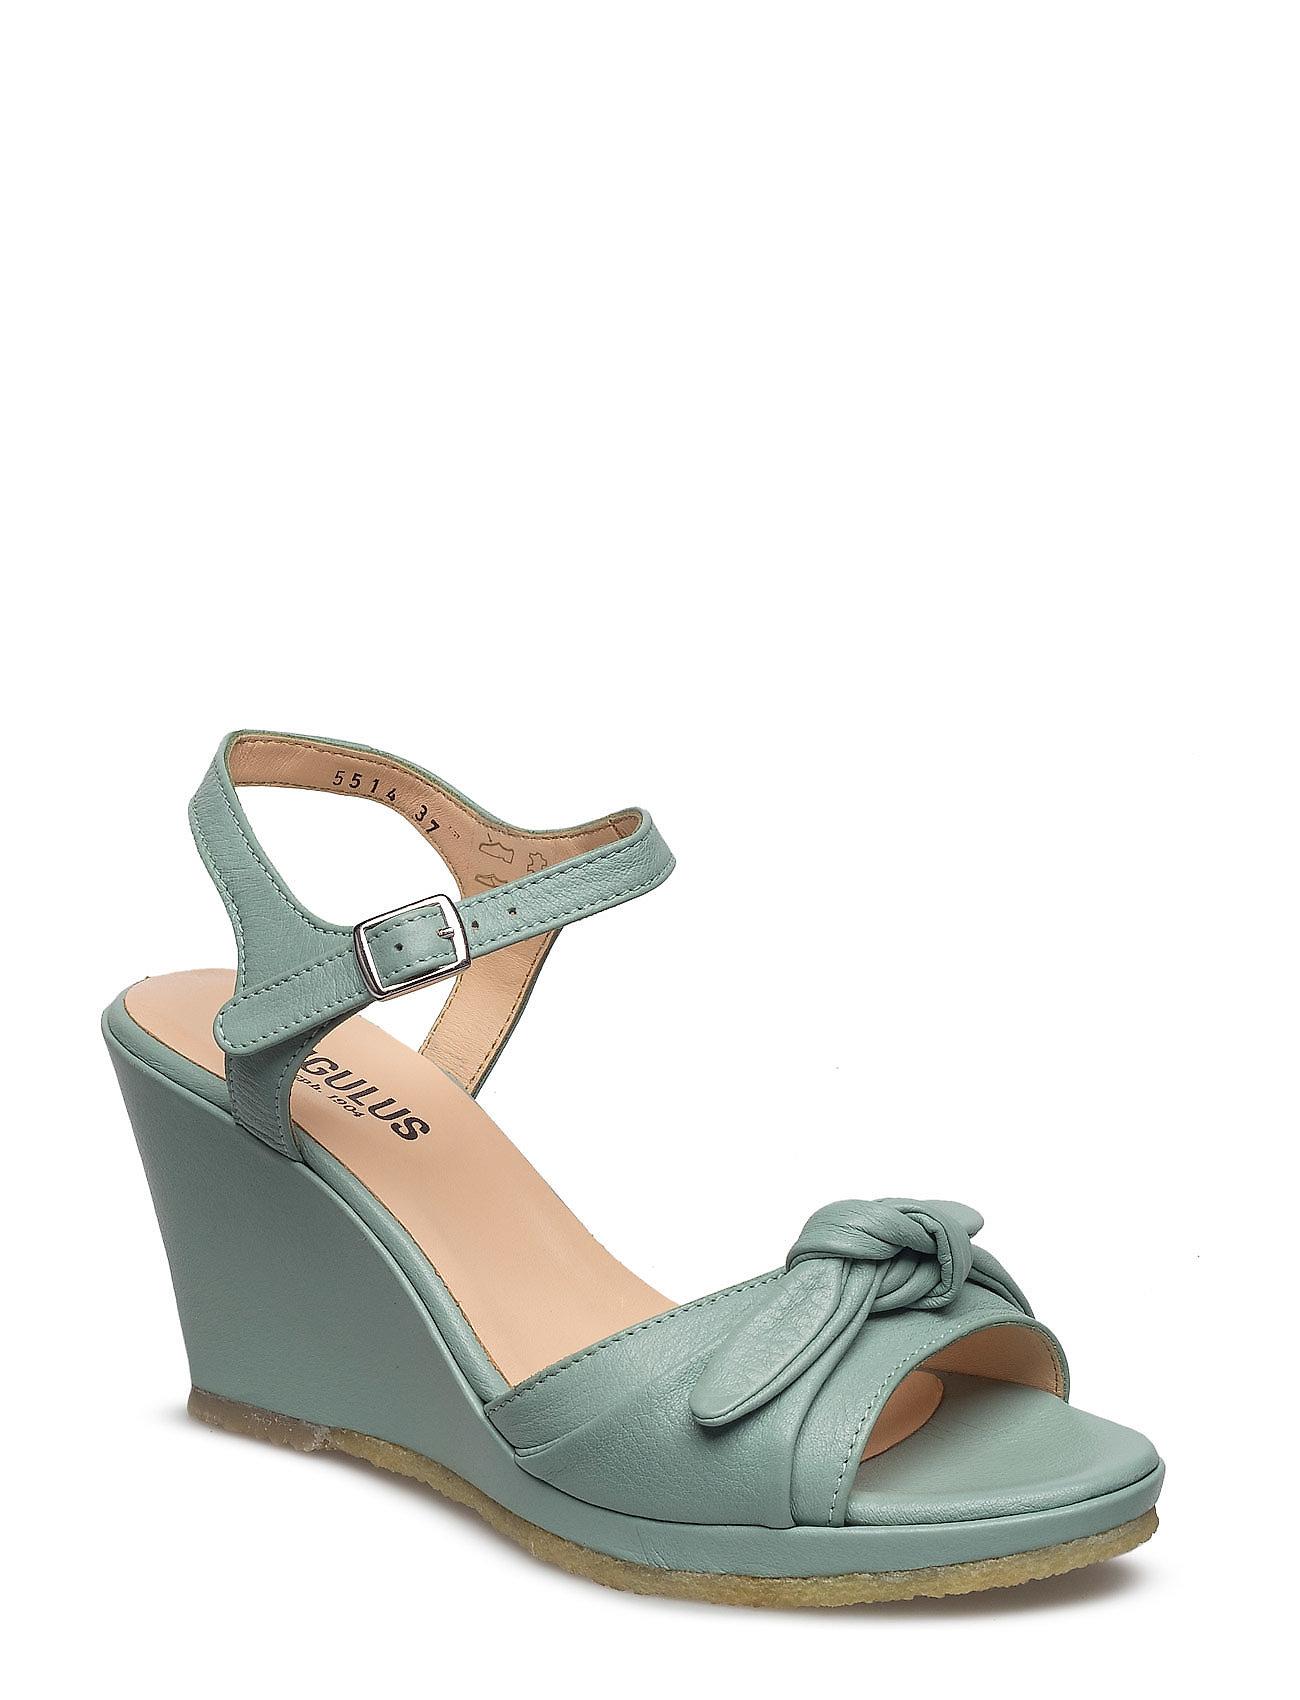 Sandals  - Wedge -Open Toe -Closed Counter ANGULUS Sandaler til Damer i